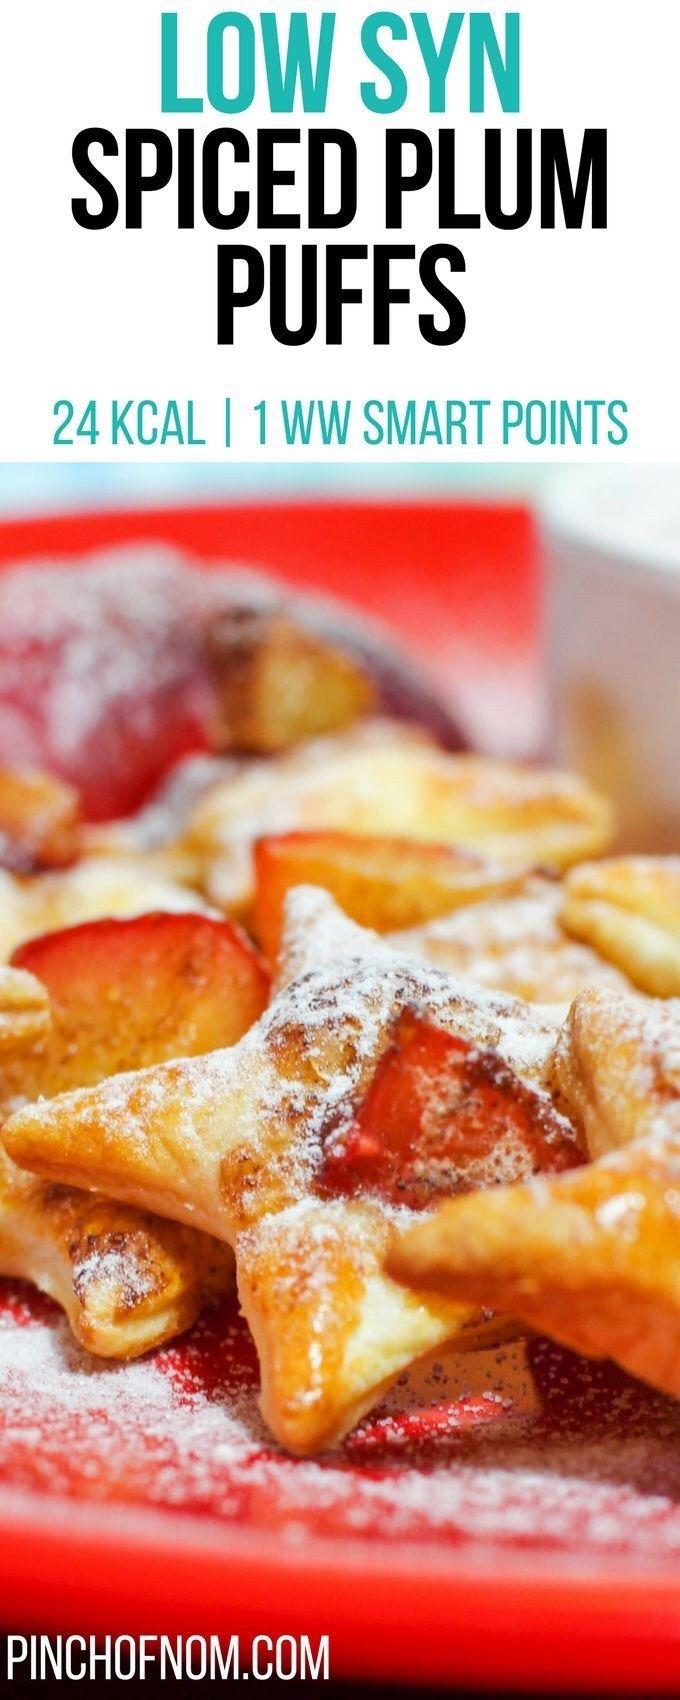 25 Delicious Festive Pastries: Sweet & Savoury